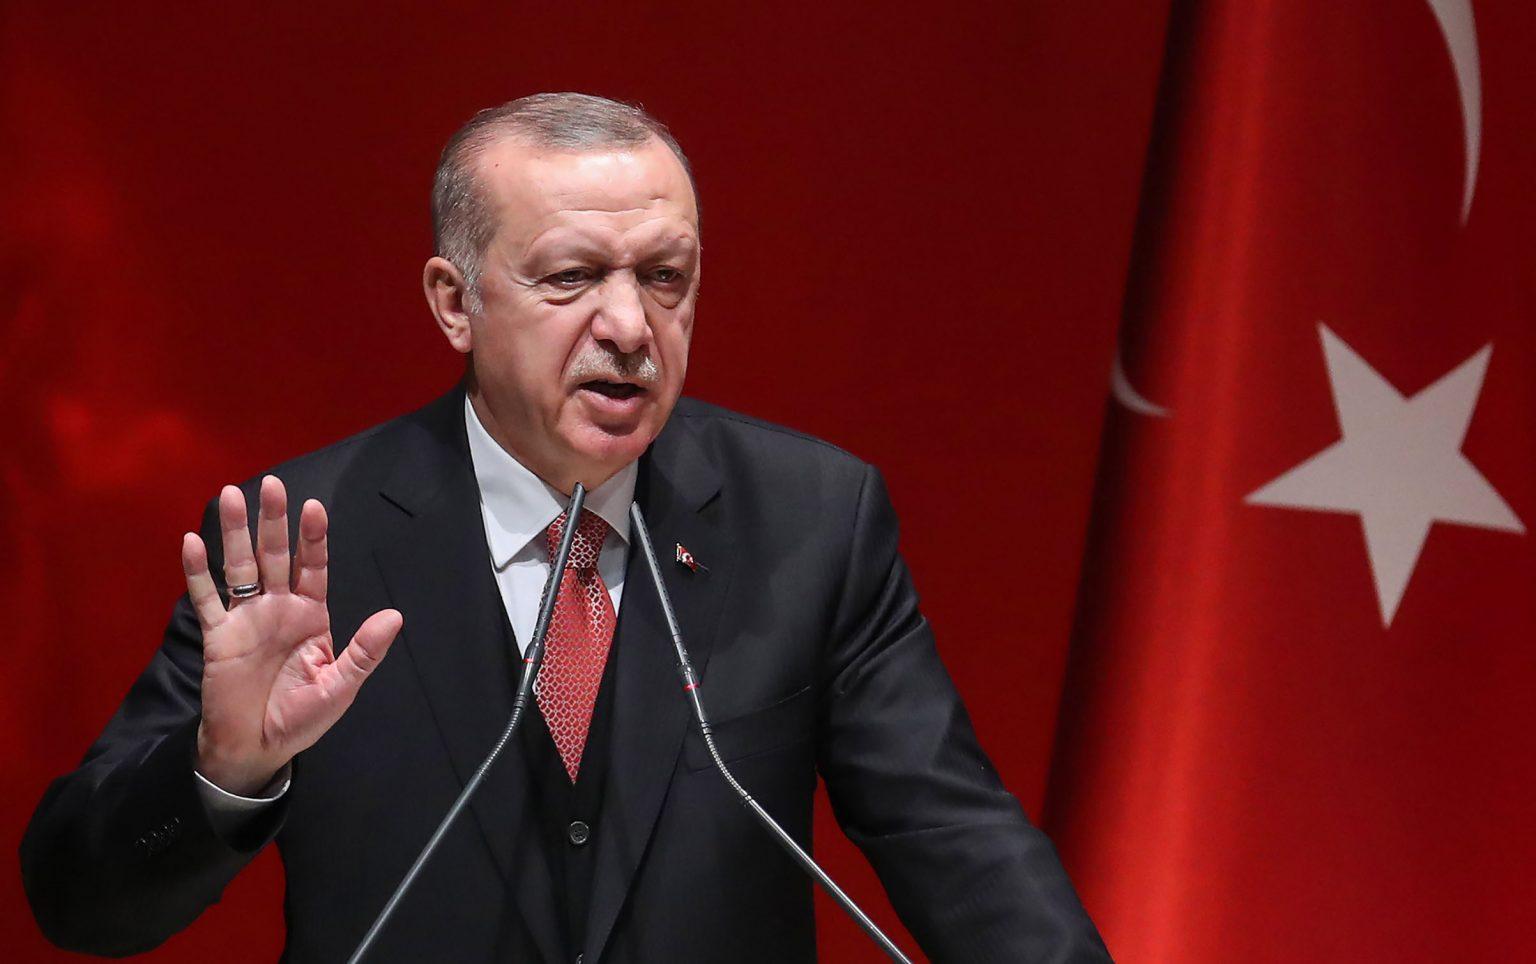 Don't mess with the Turkish people - Erdogan warns Macron